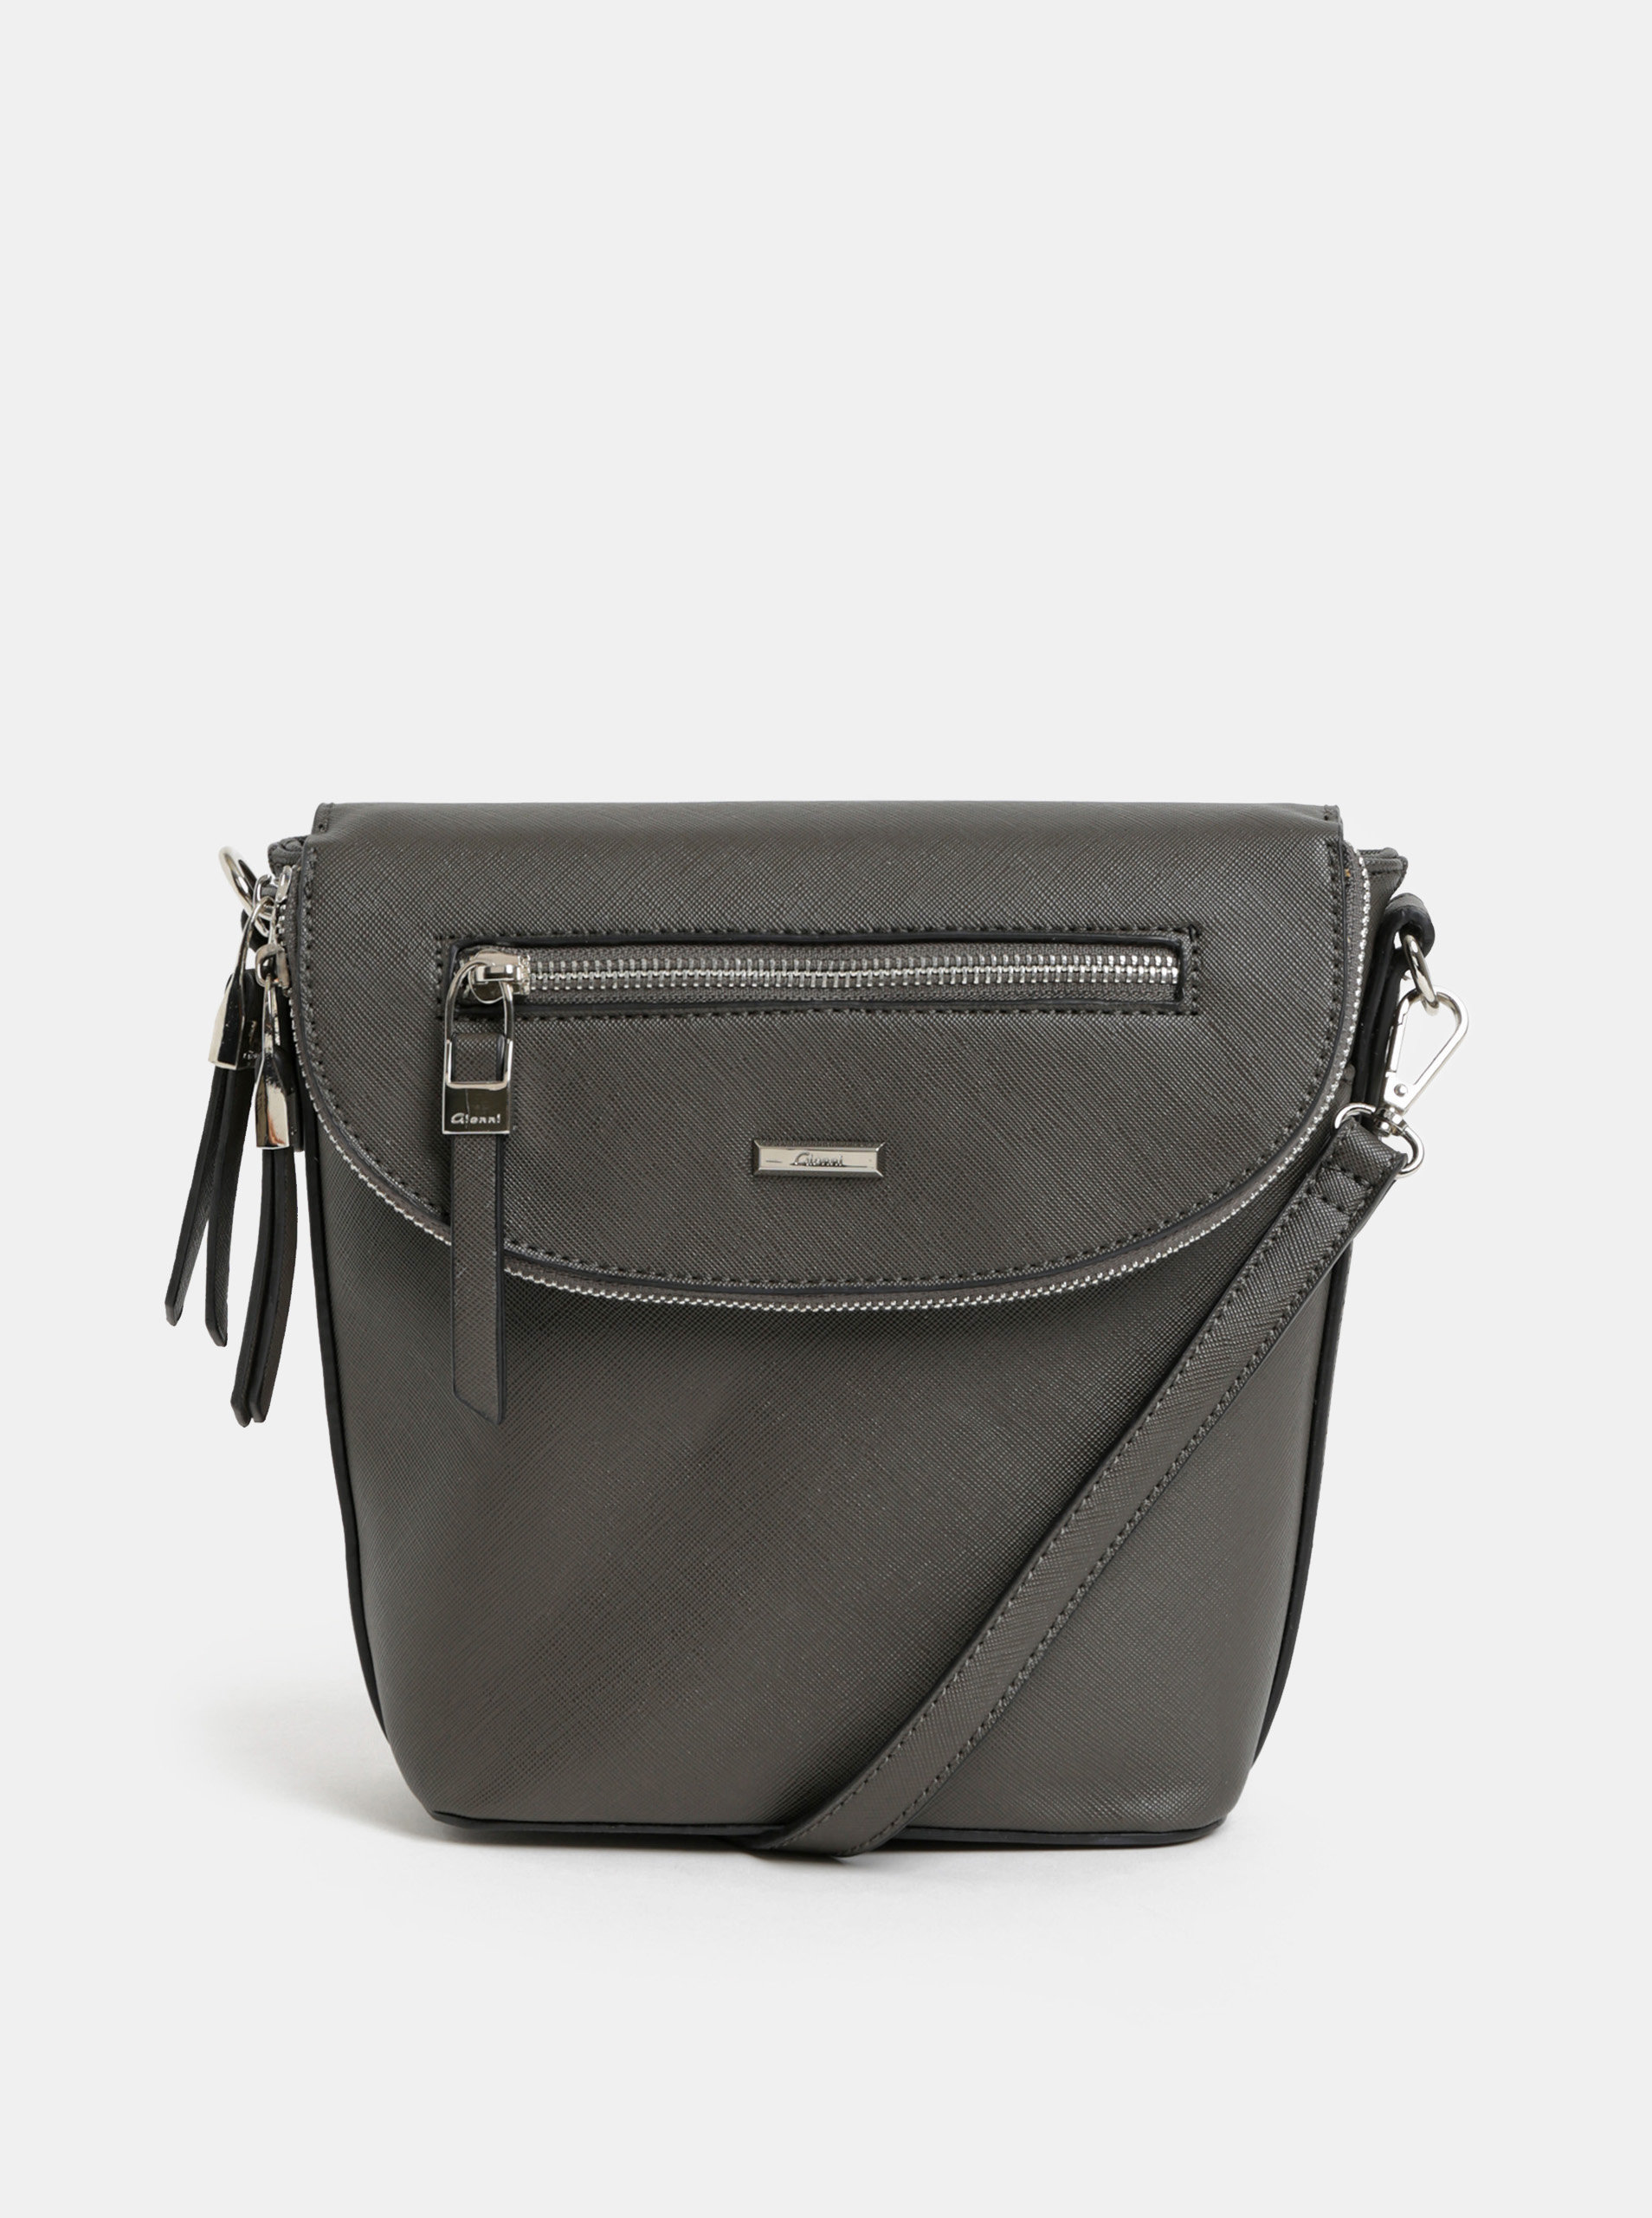 Tmavě šedá kabelka batoh s detaily ve stříbrné barvě Gionni Iris ... 3fb64ba429b